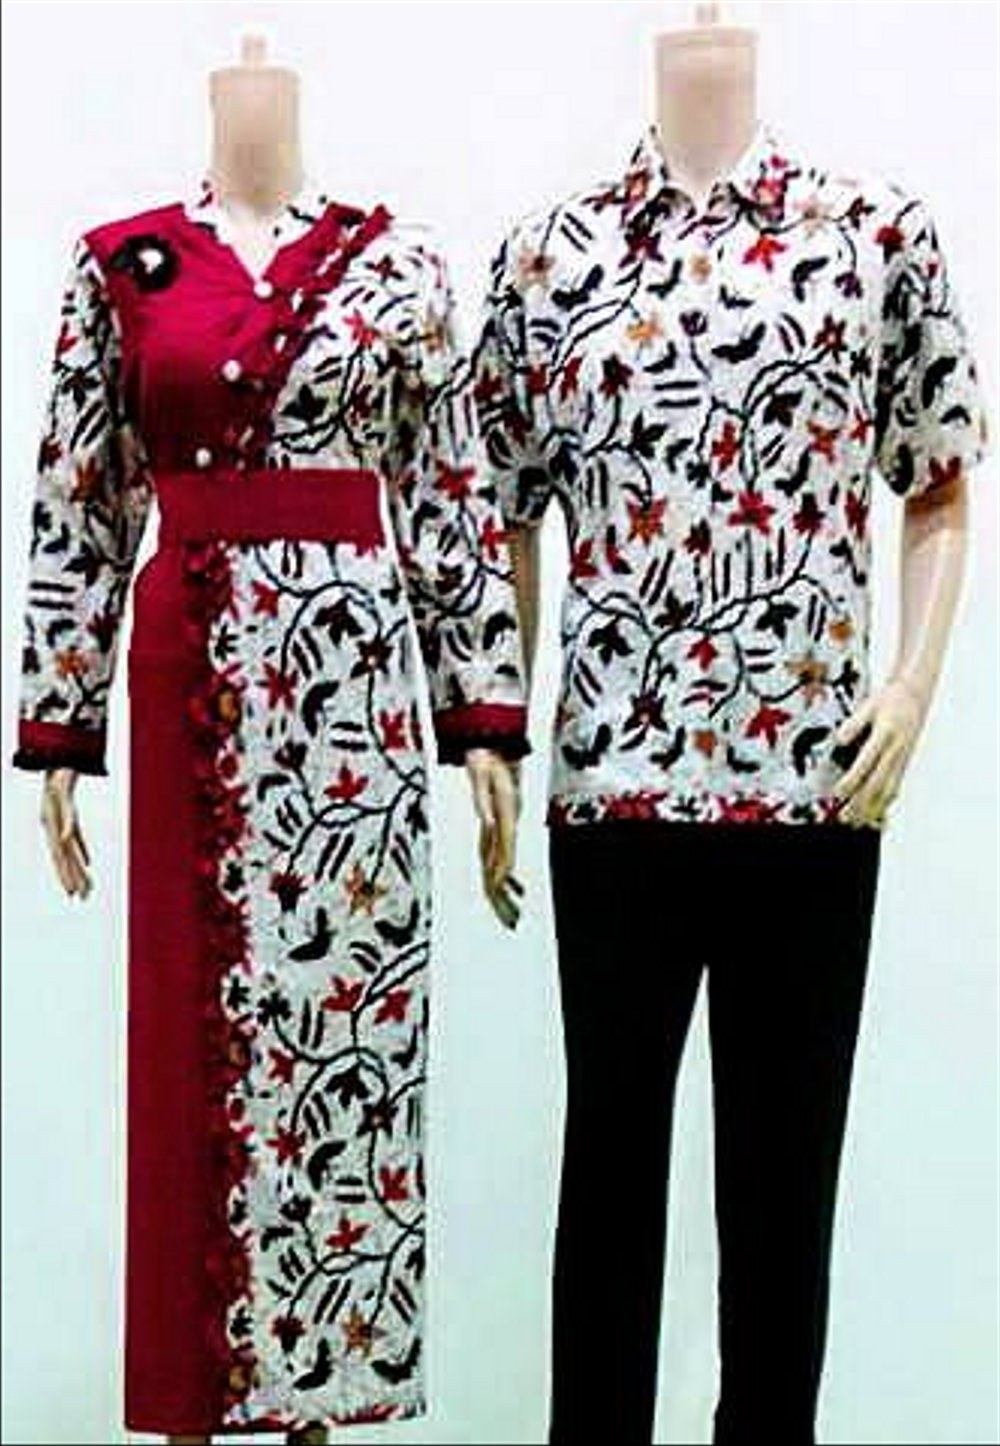 Bentuk Baju Lebaran Remaja Kekinian Fmdf Jual Diskon Baju Batik Sarimbit Muslim Sg 247 Kebaya